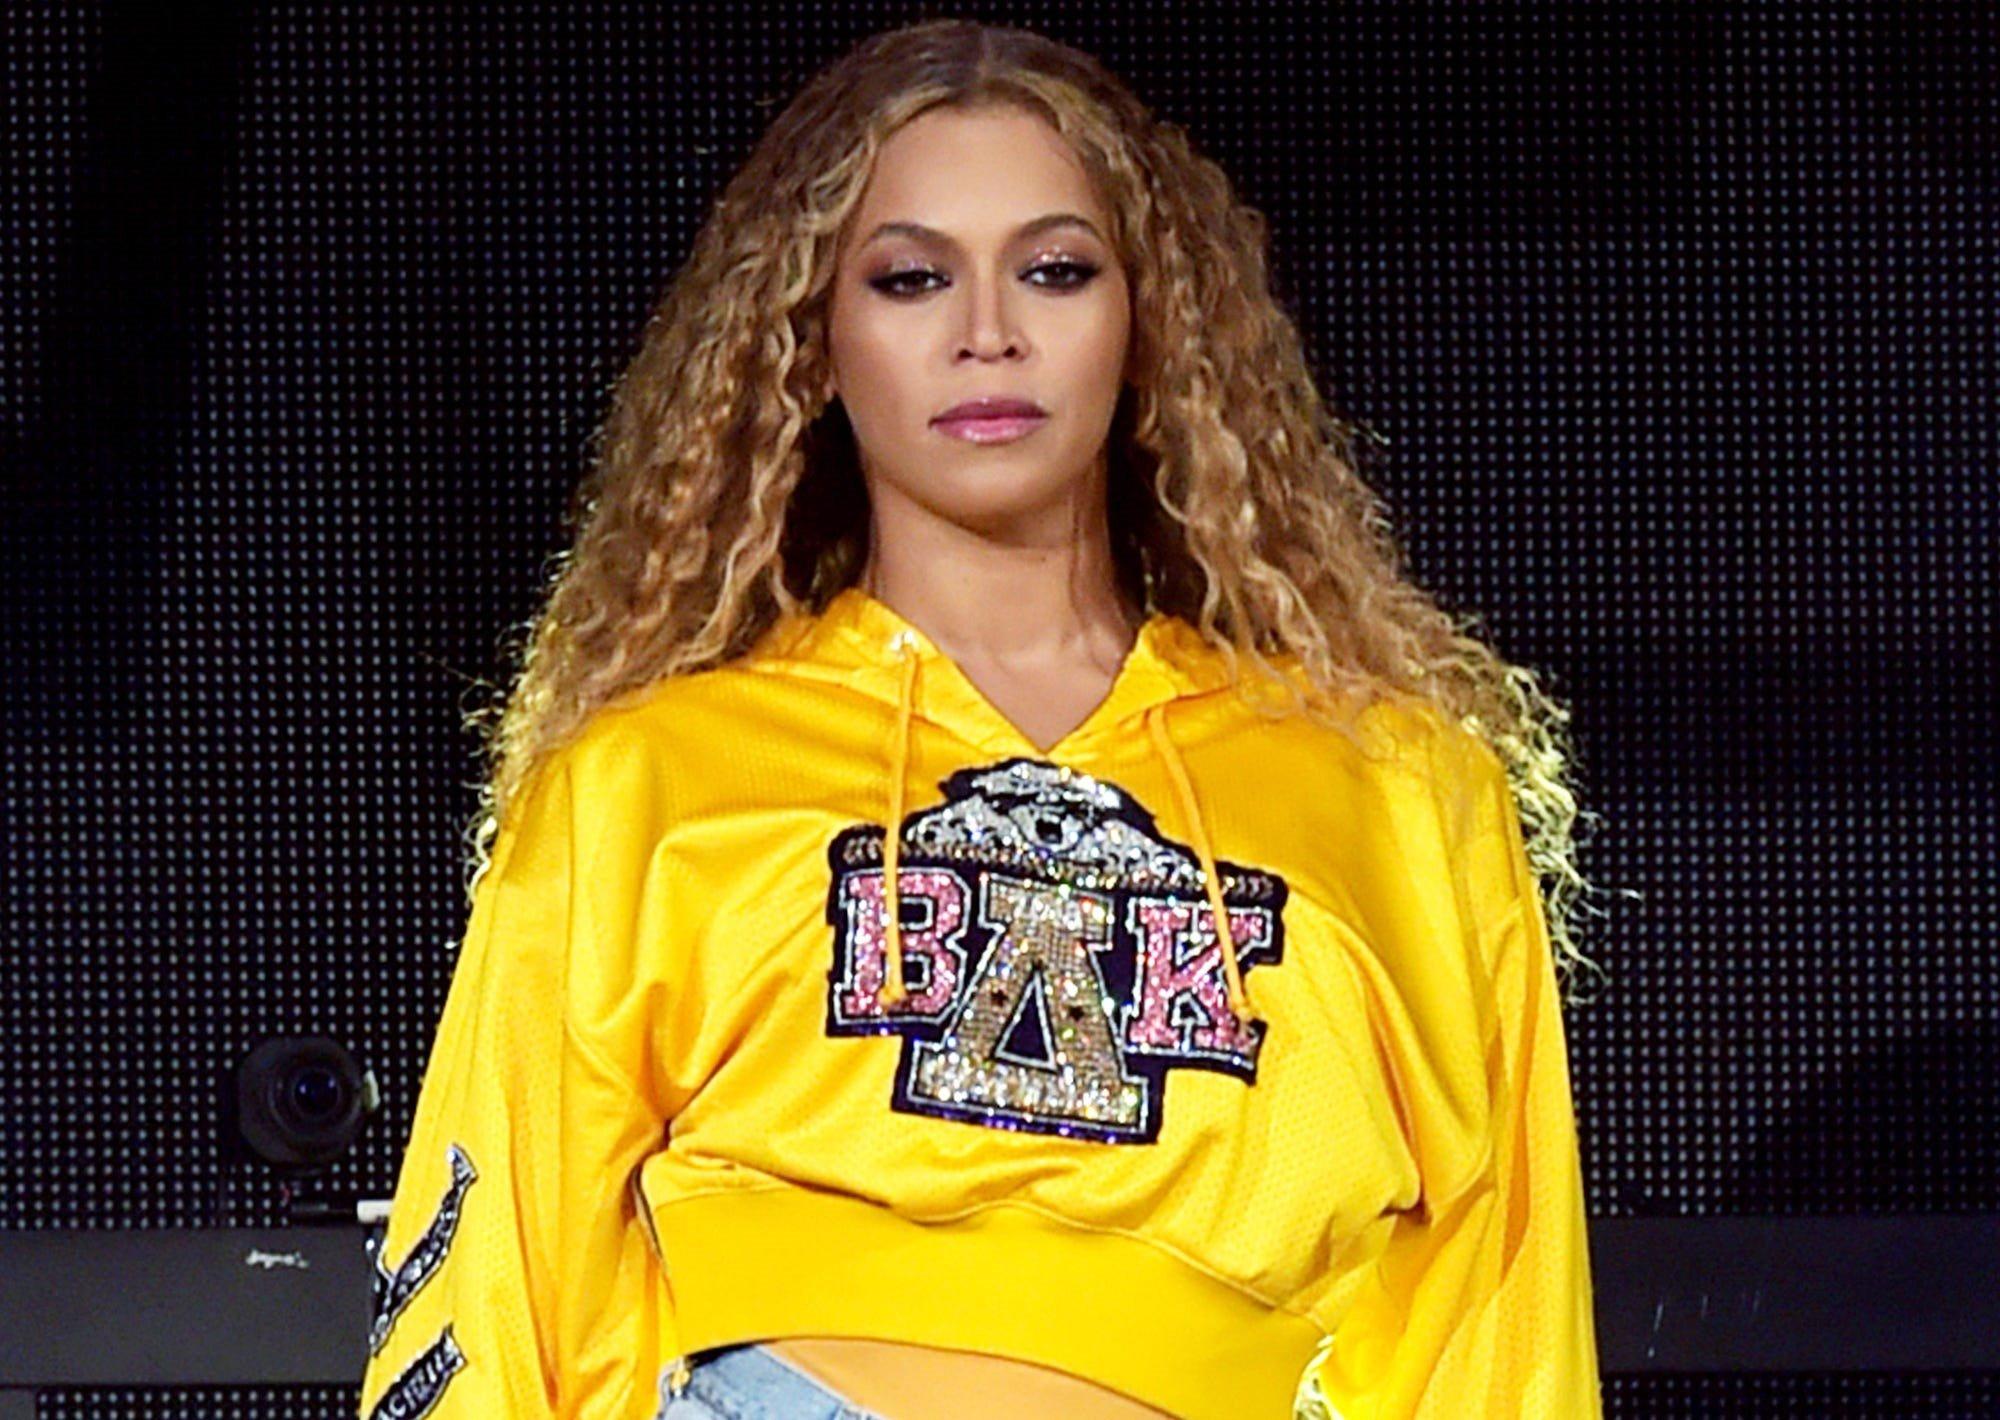 Beyonce Jay-Z Blue Ivy Carter Lookalike